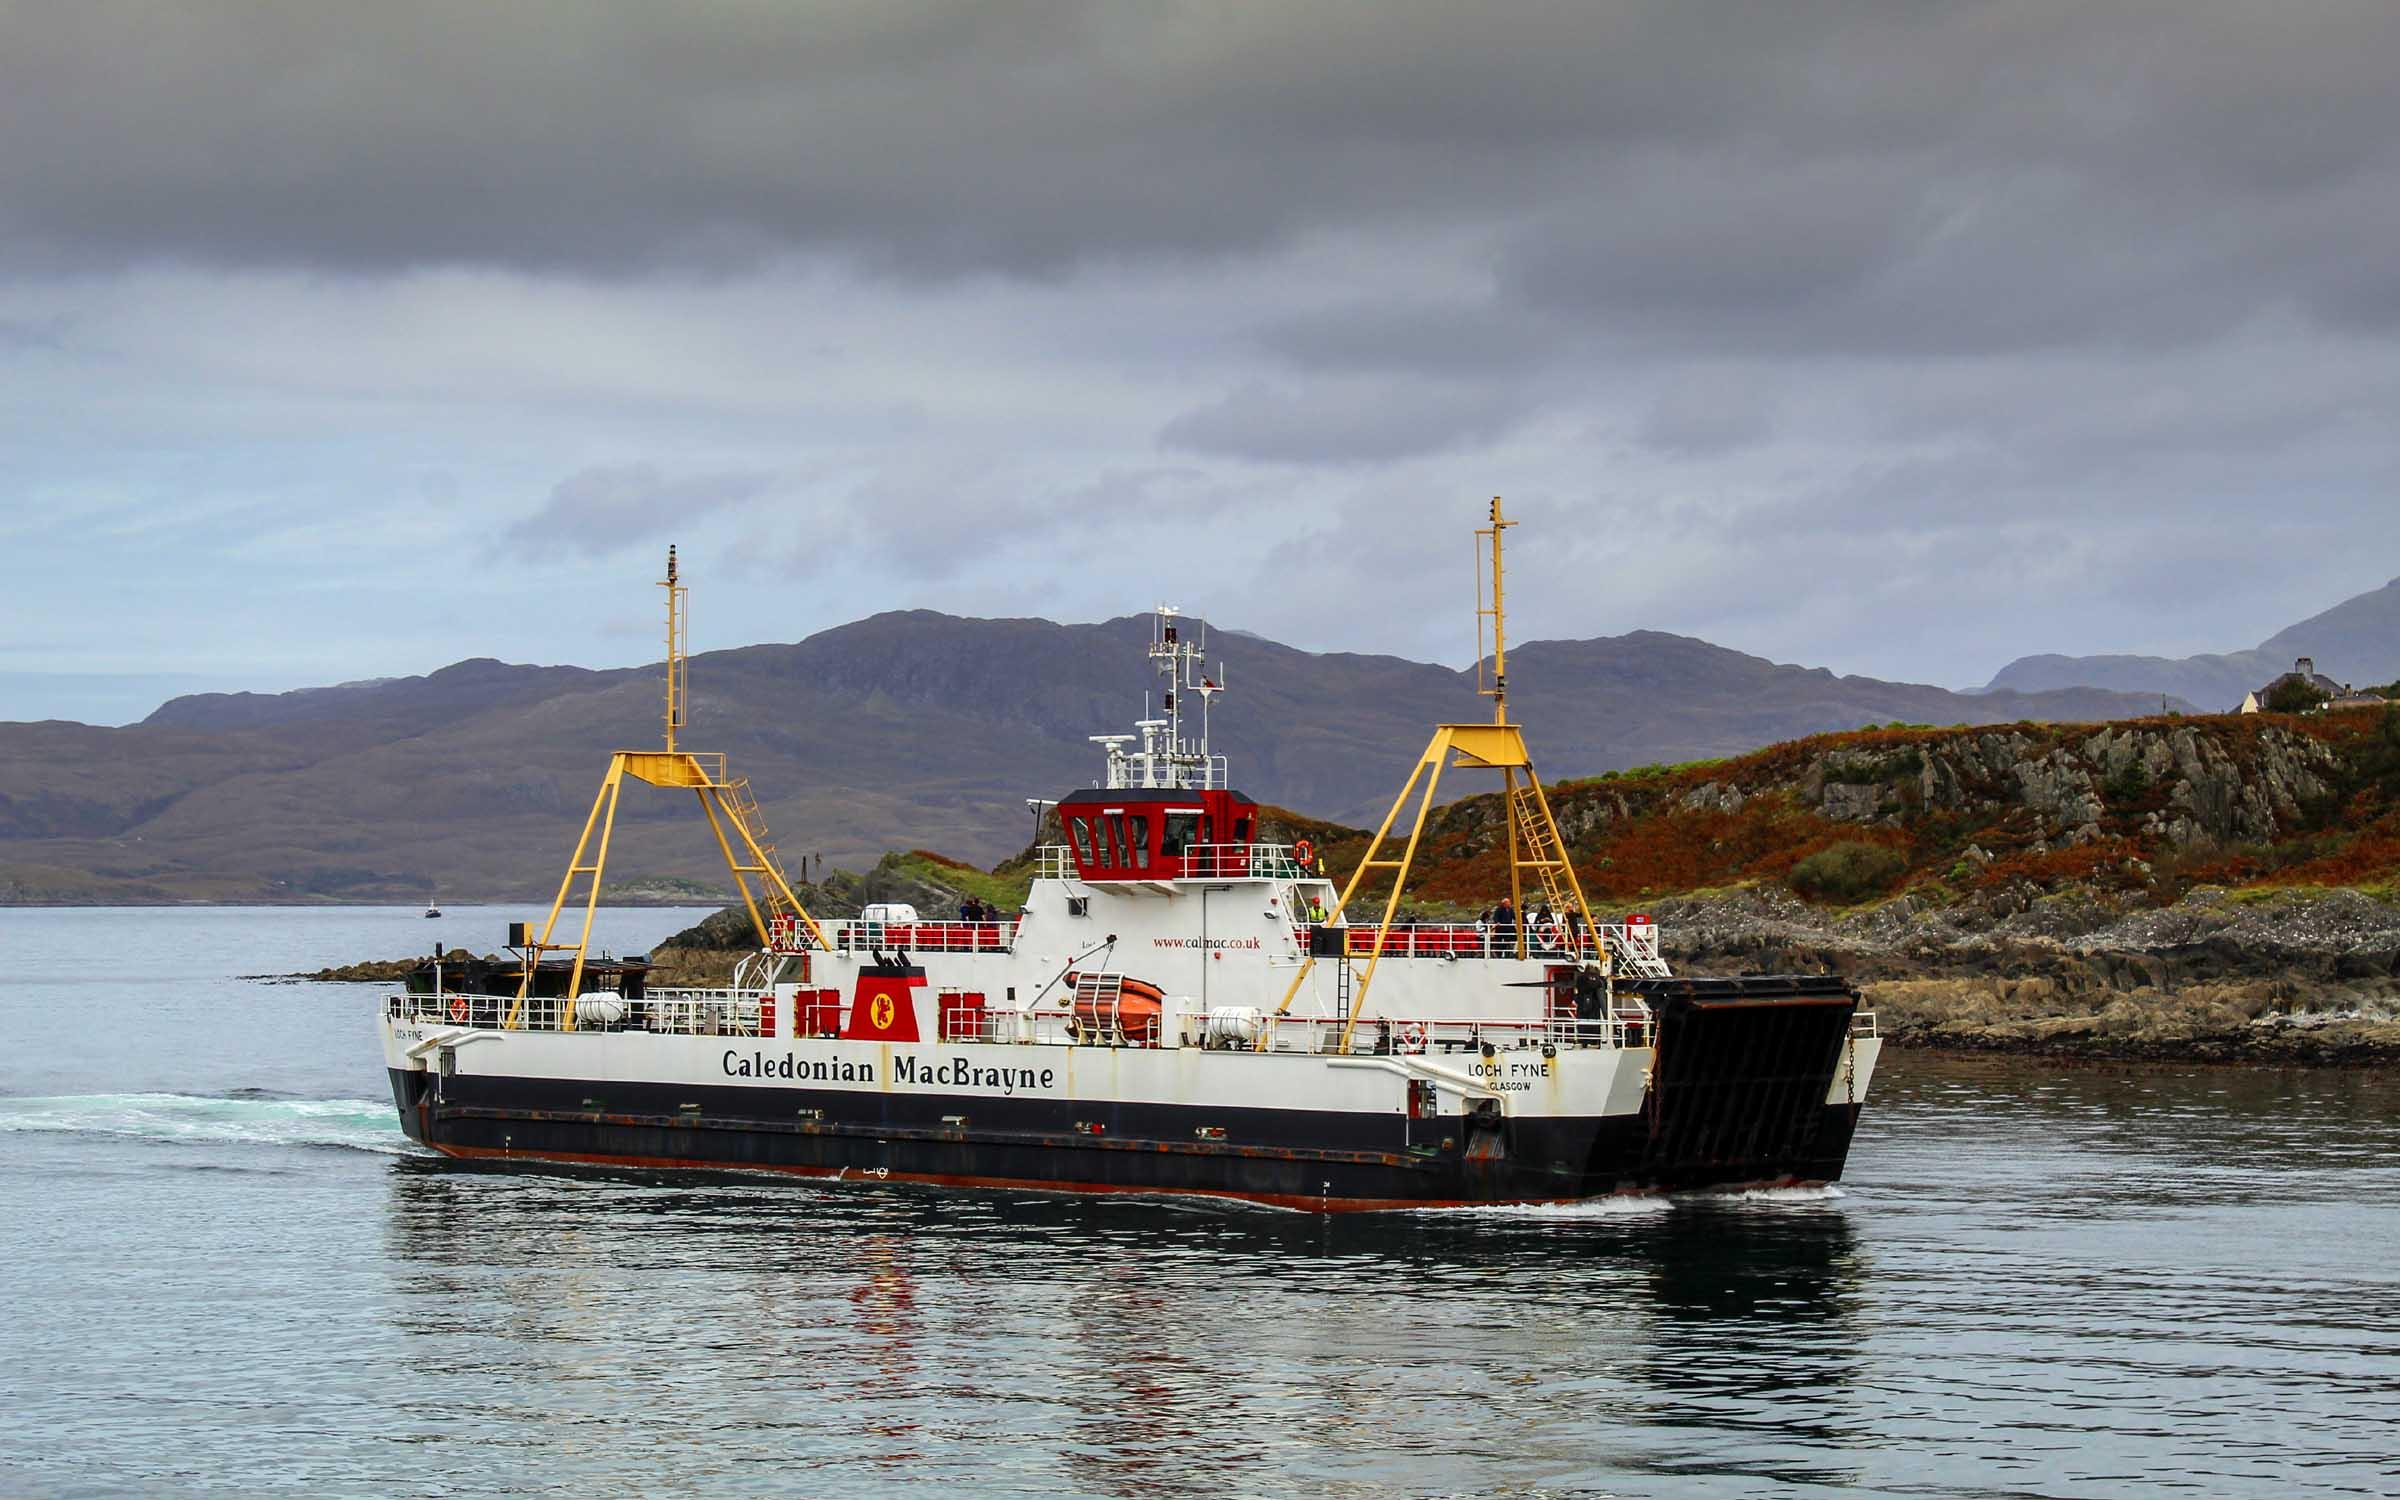 Loch Fyne arriving in Mallaig harbour (Ships of CalMac)